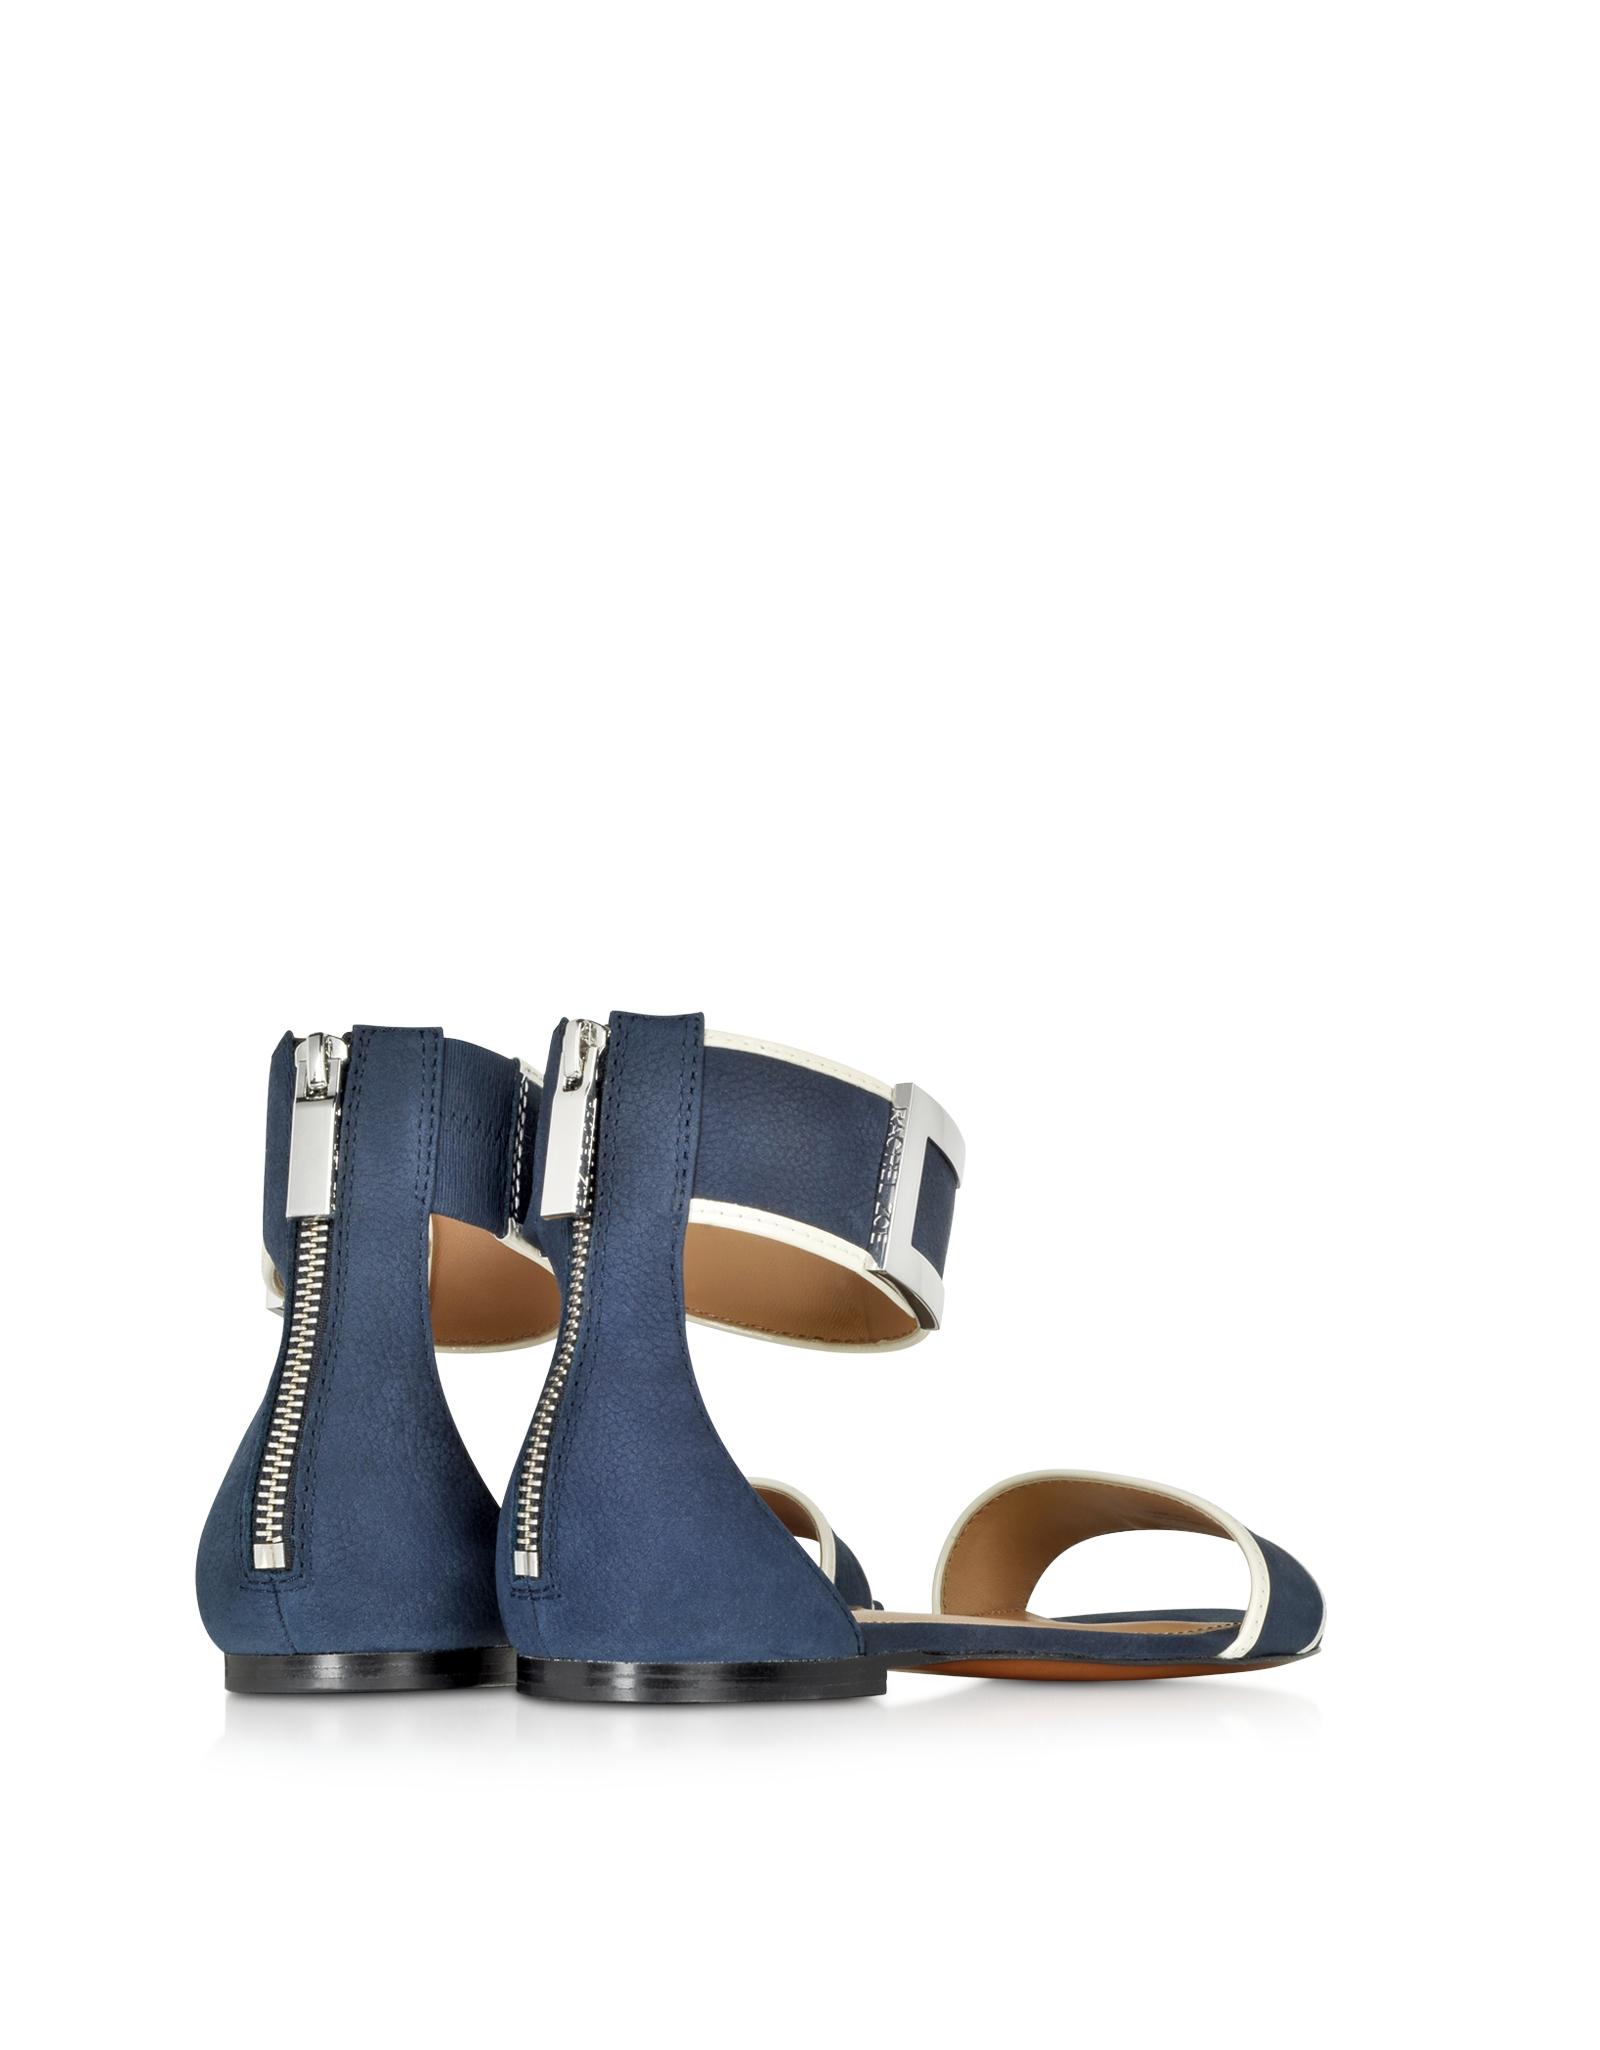 Rachel Zoe Gracie Navy Blue and White Flat Sandal in Blue ...